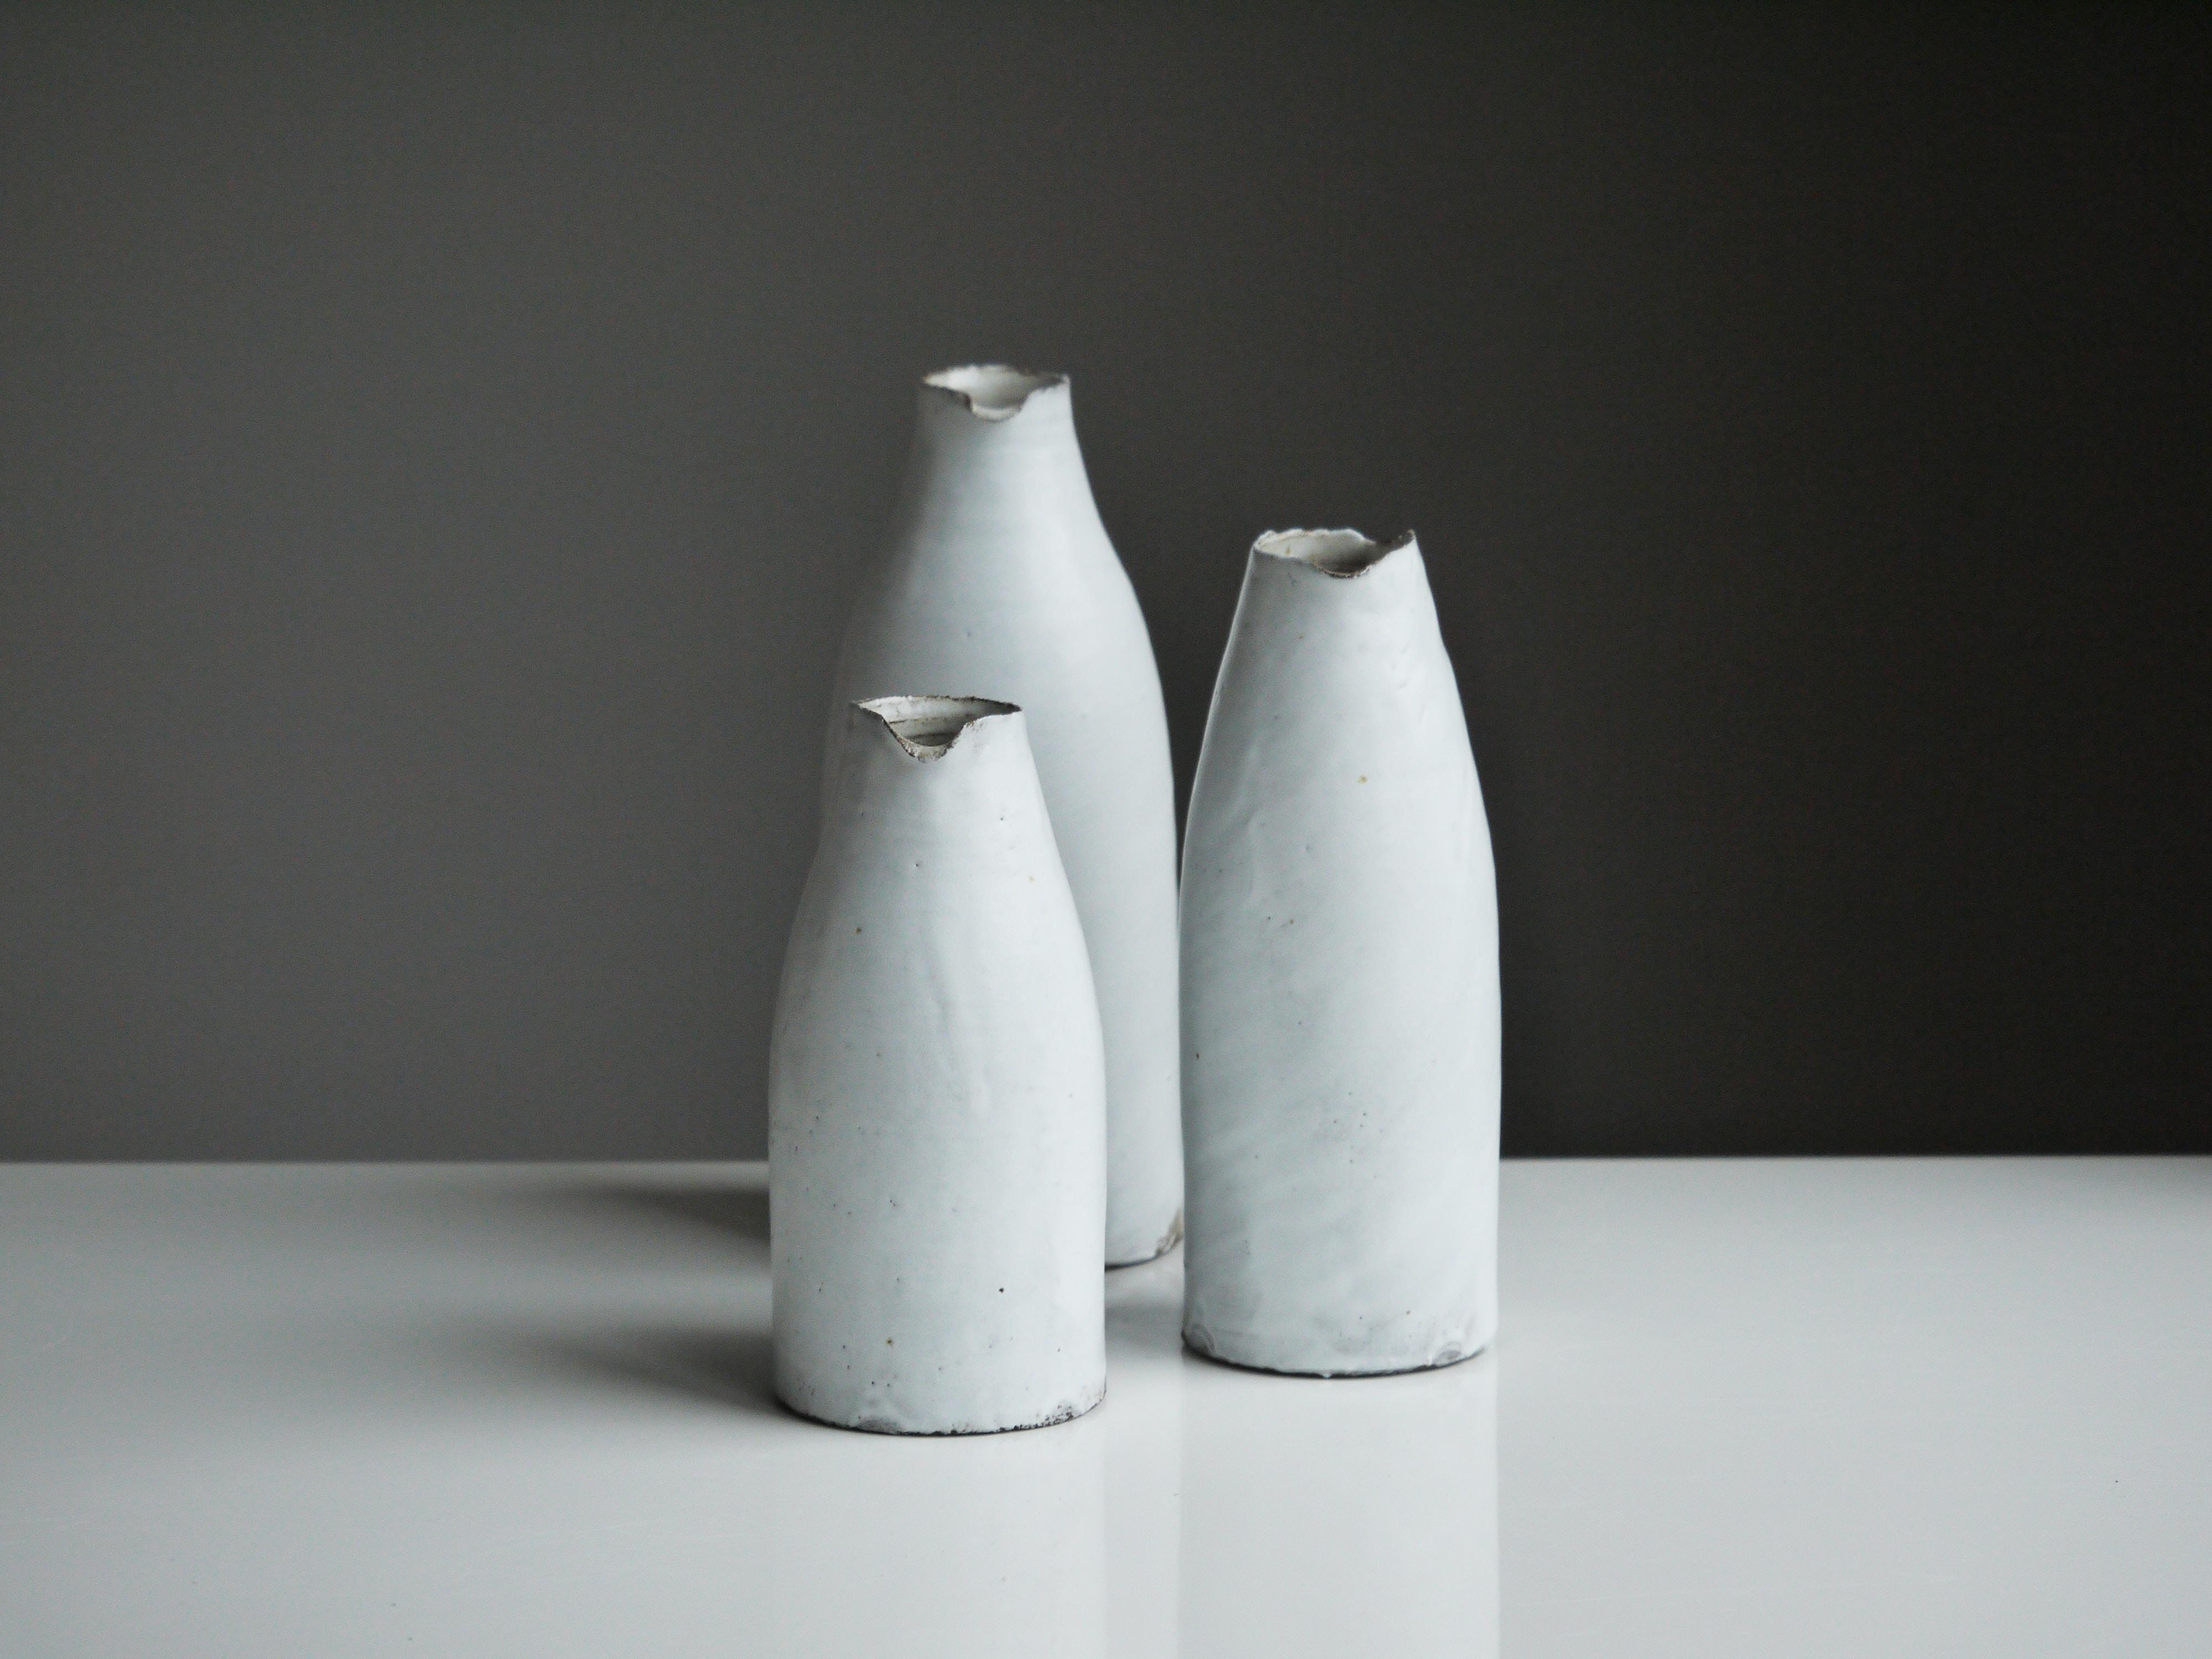 three white vases on table